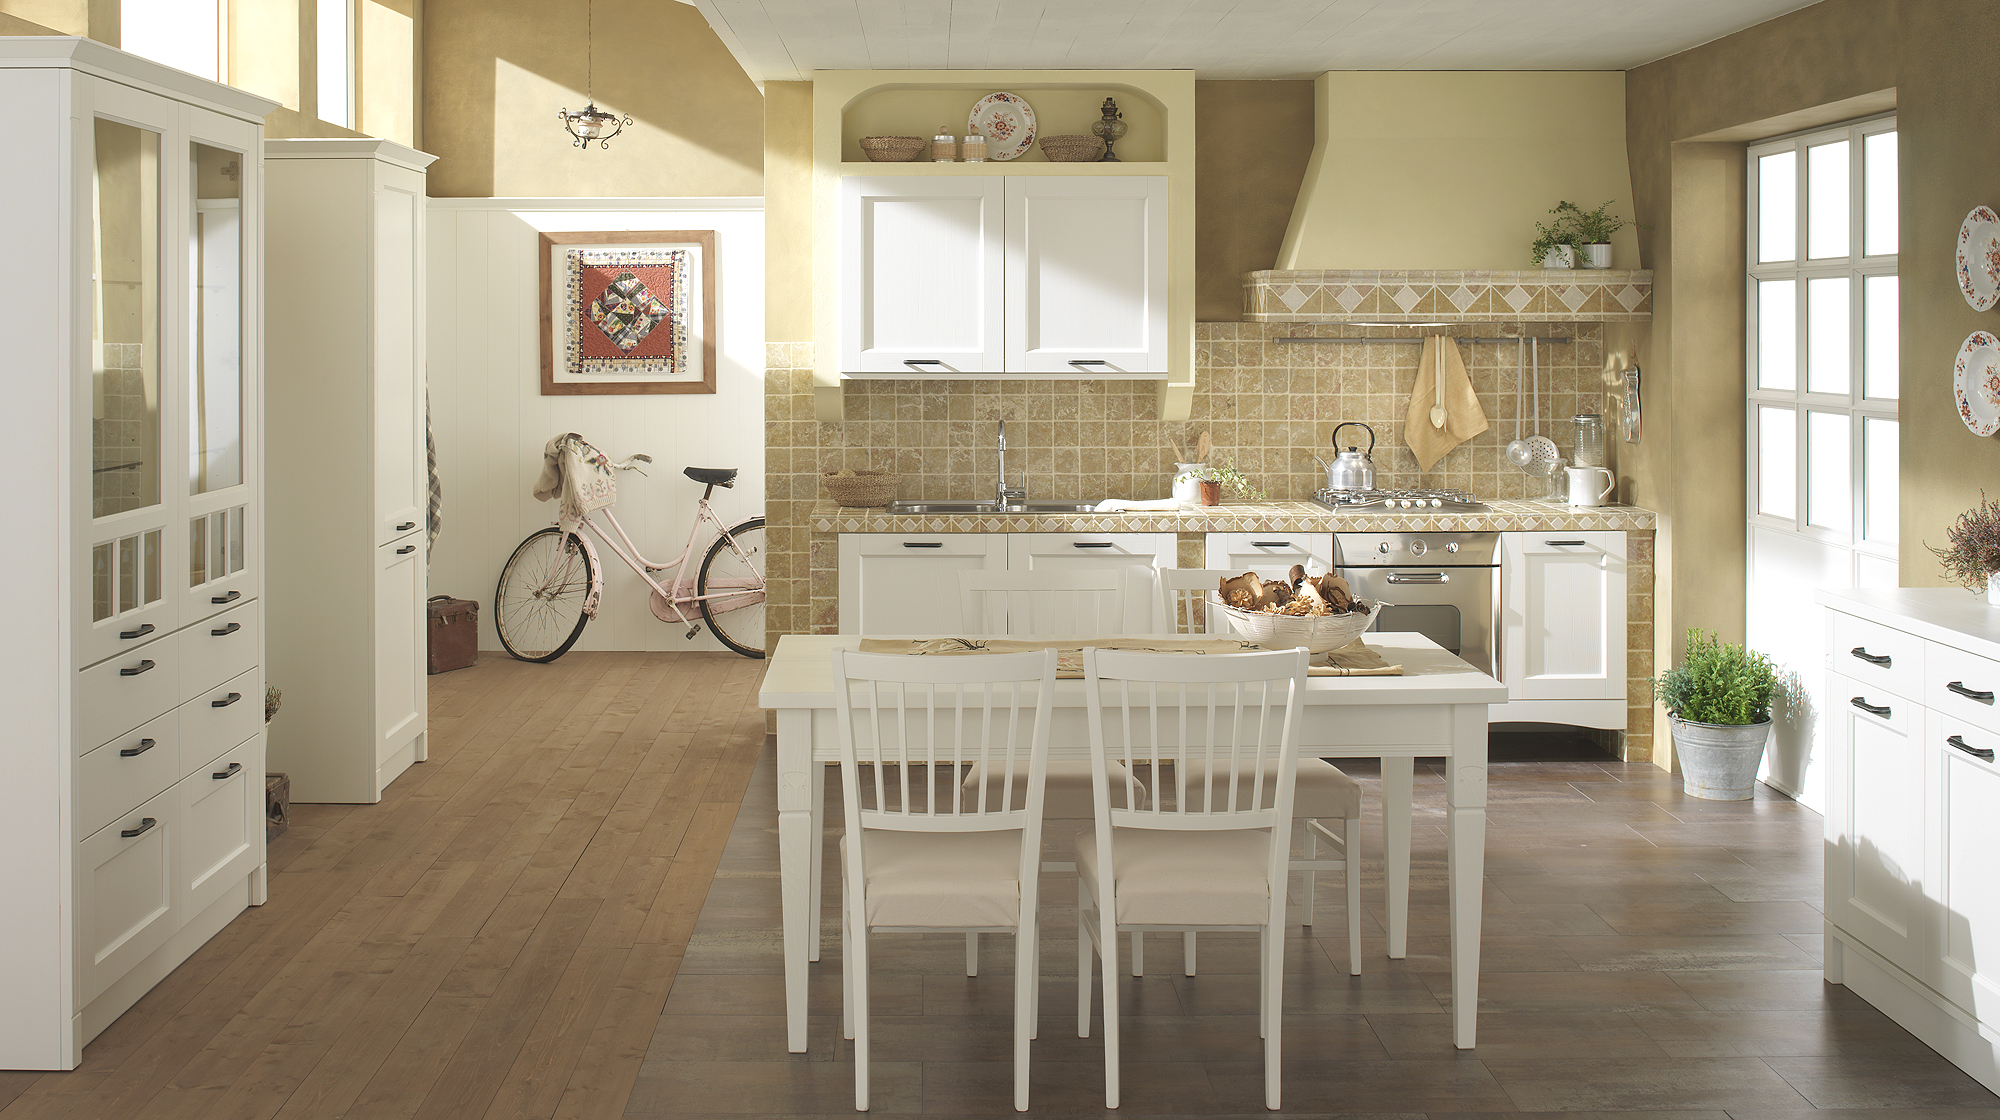 Кремово-белая уютная кухня кантри